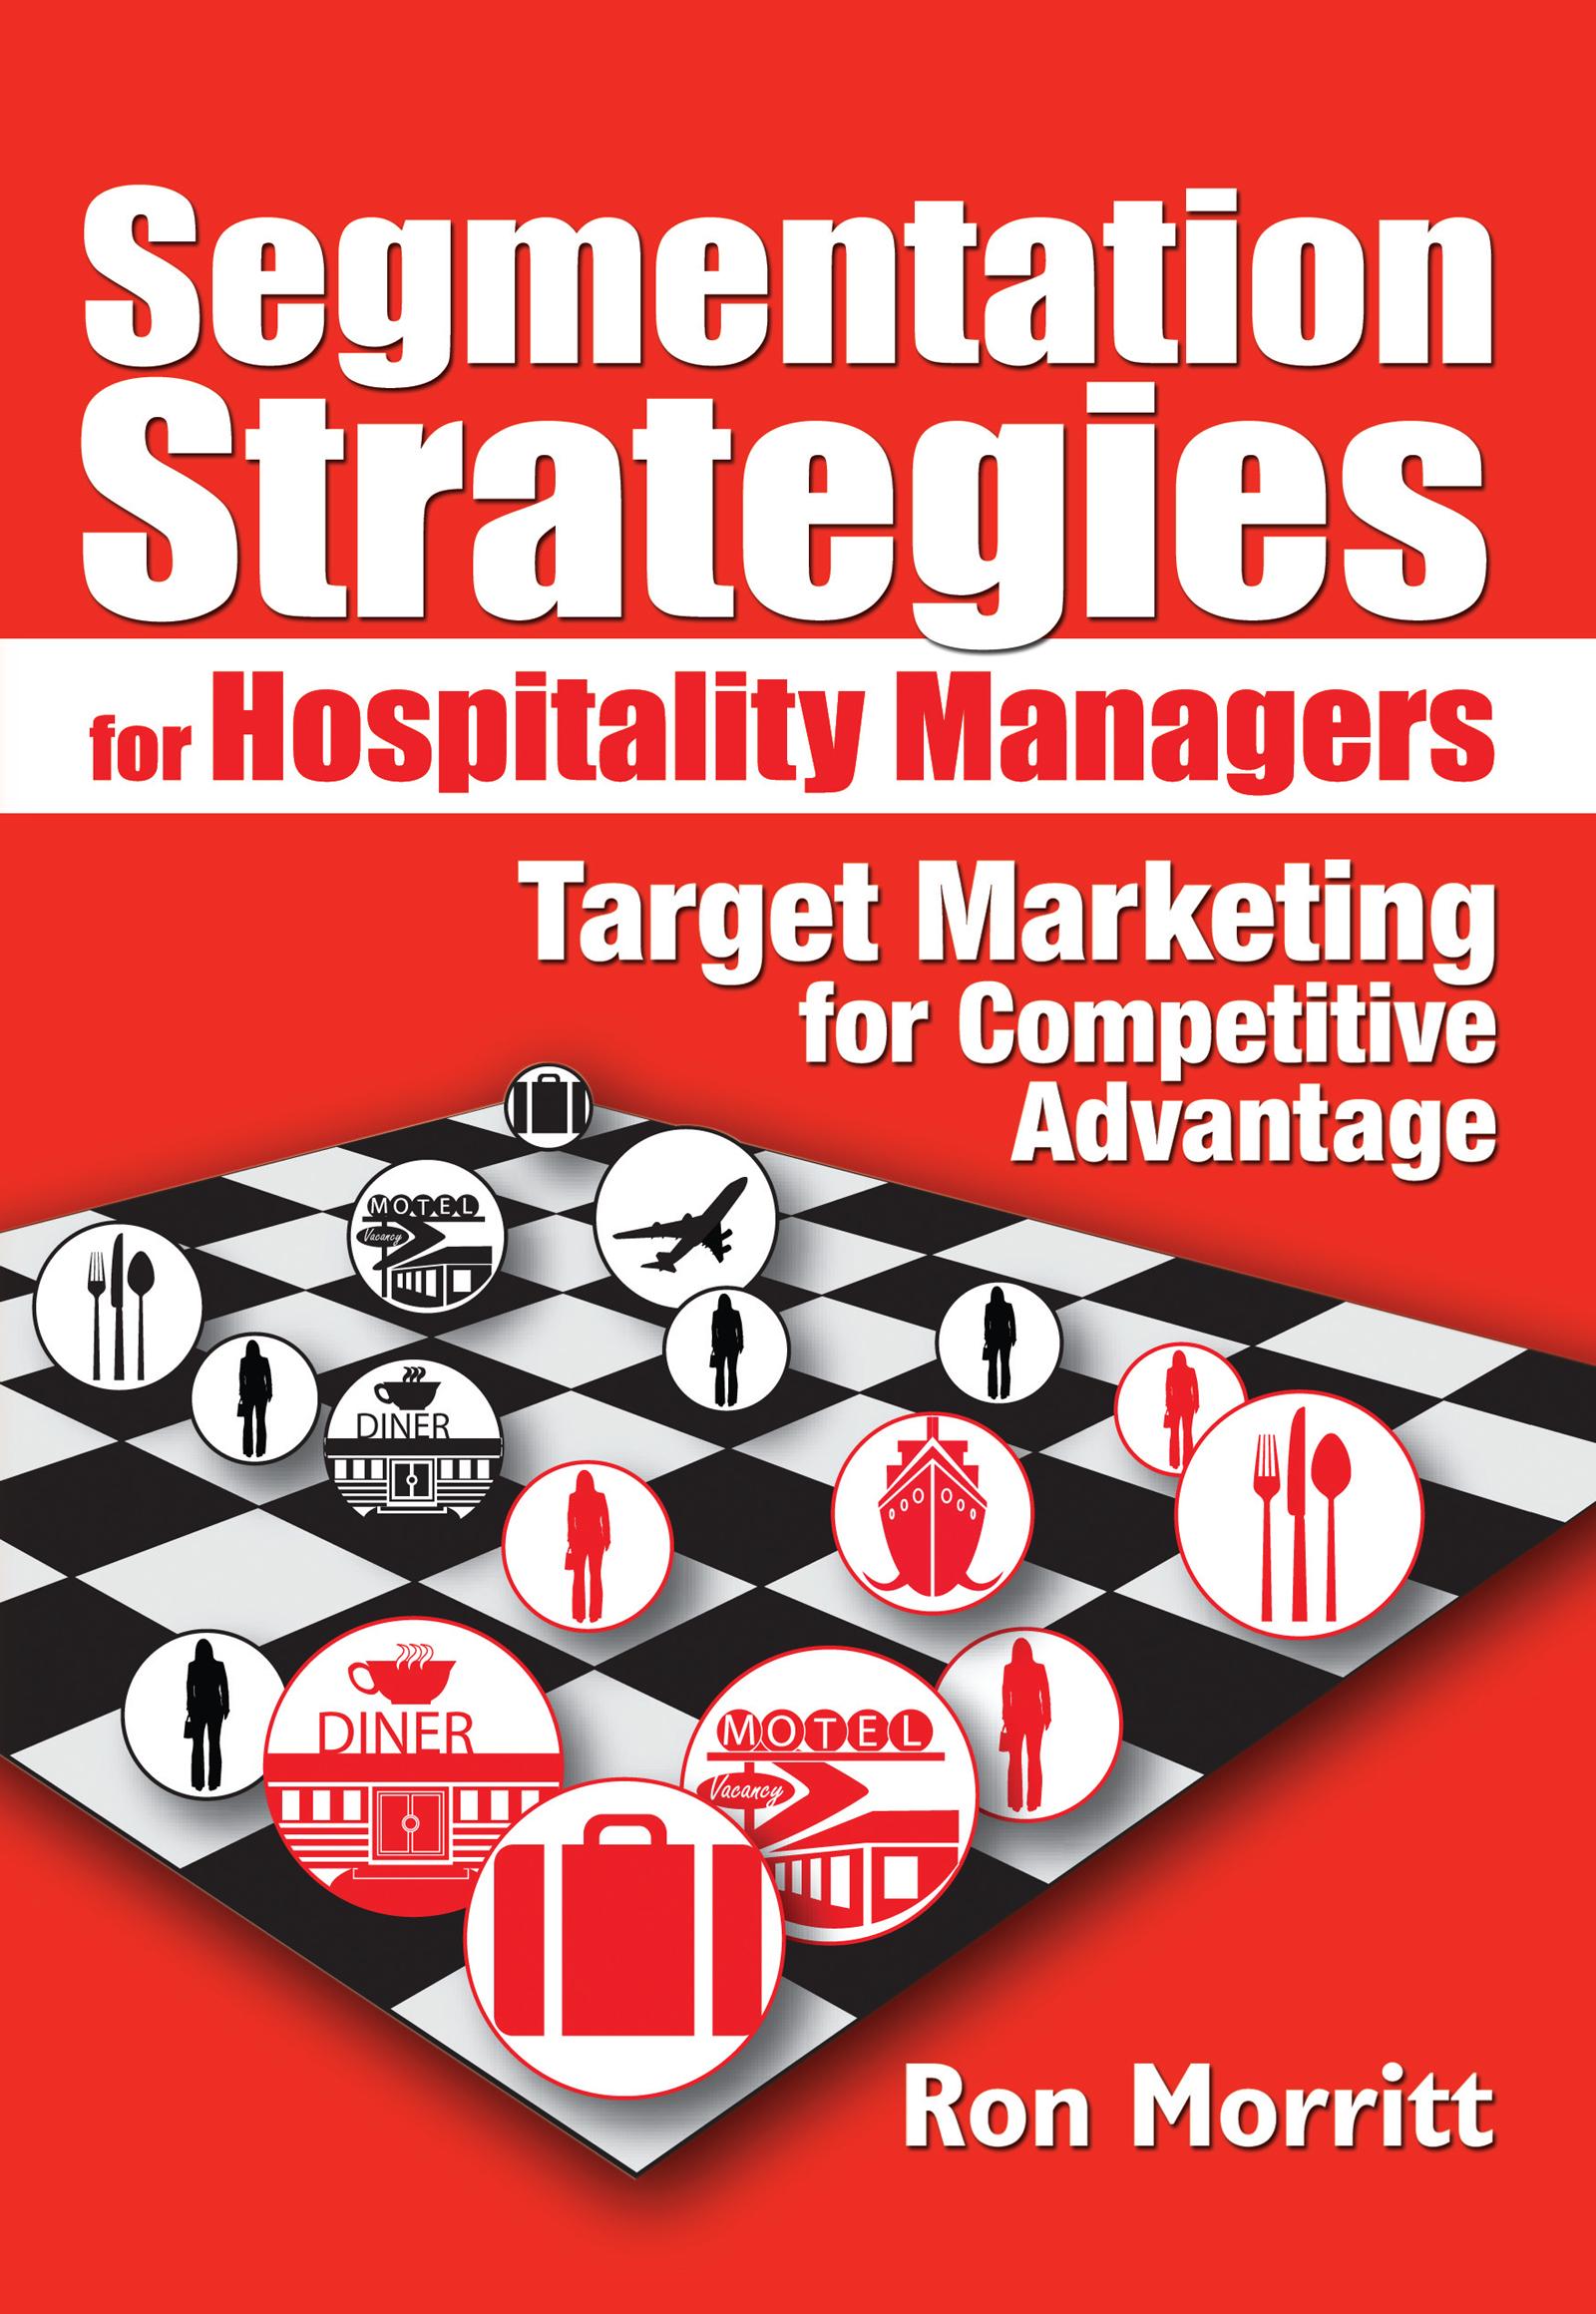 Segmentation Strategies for Hospitality Managers